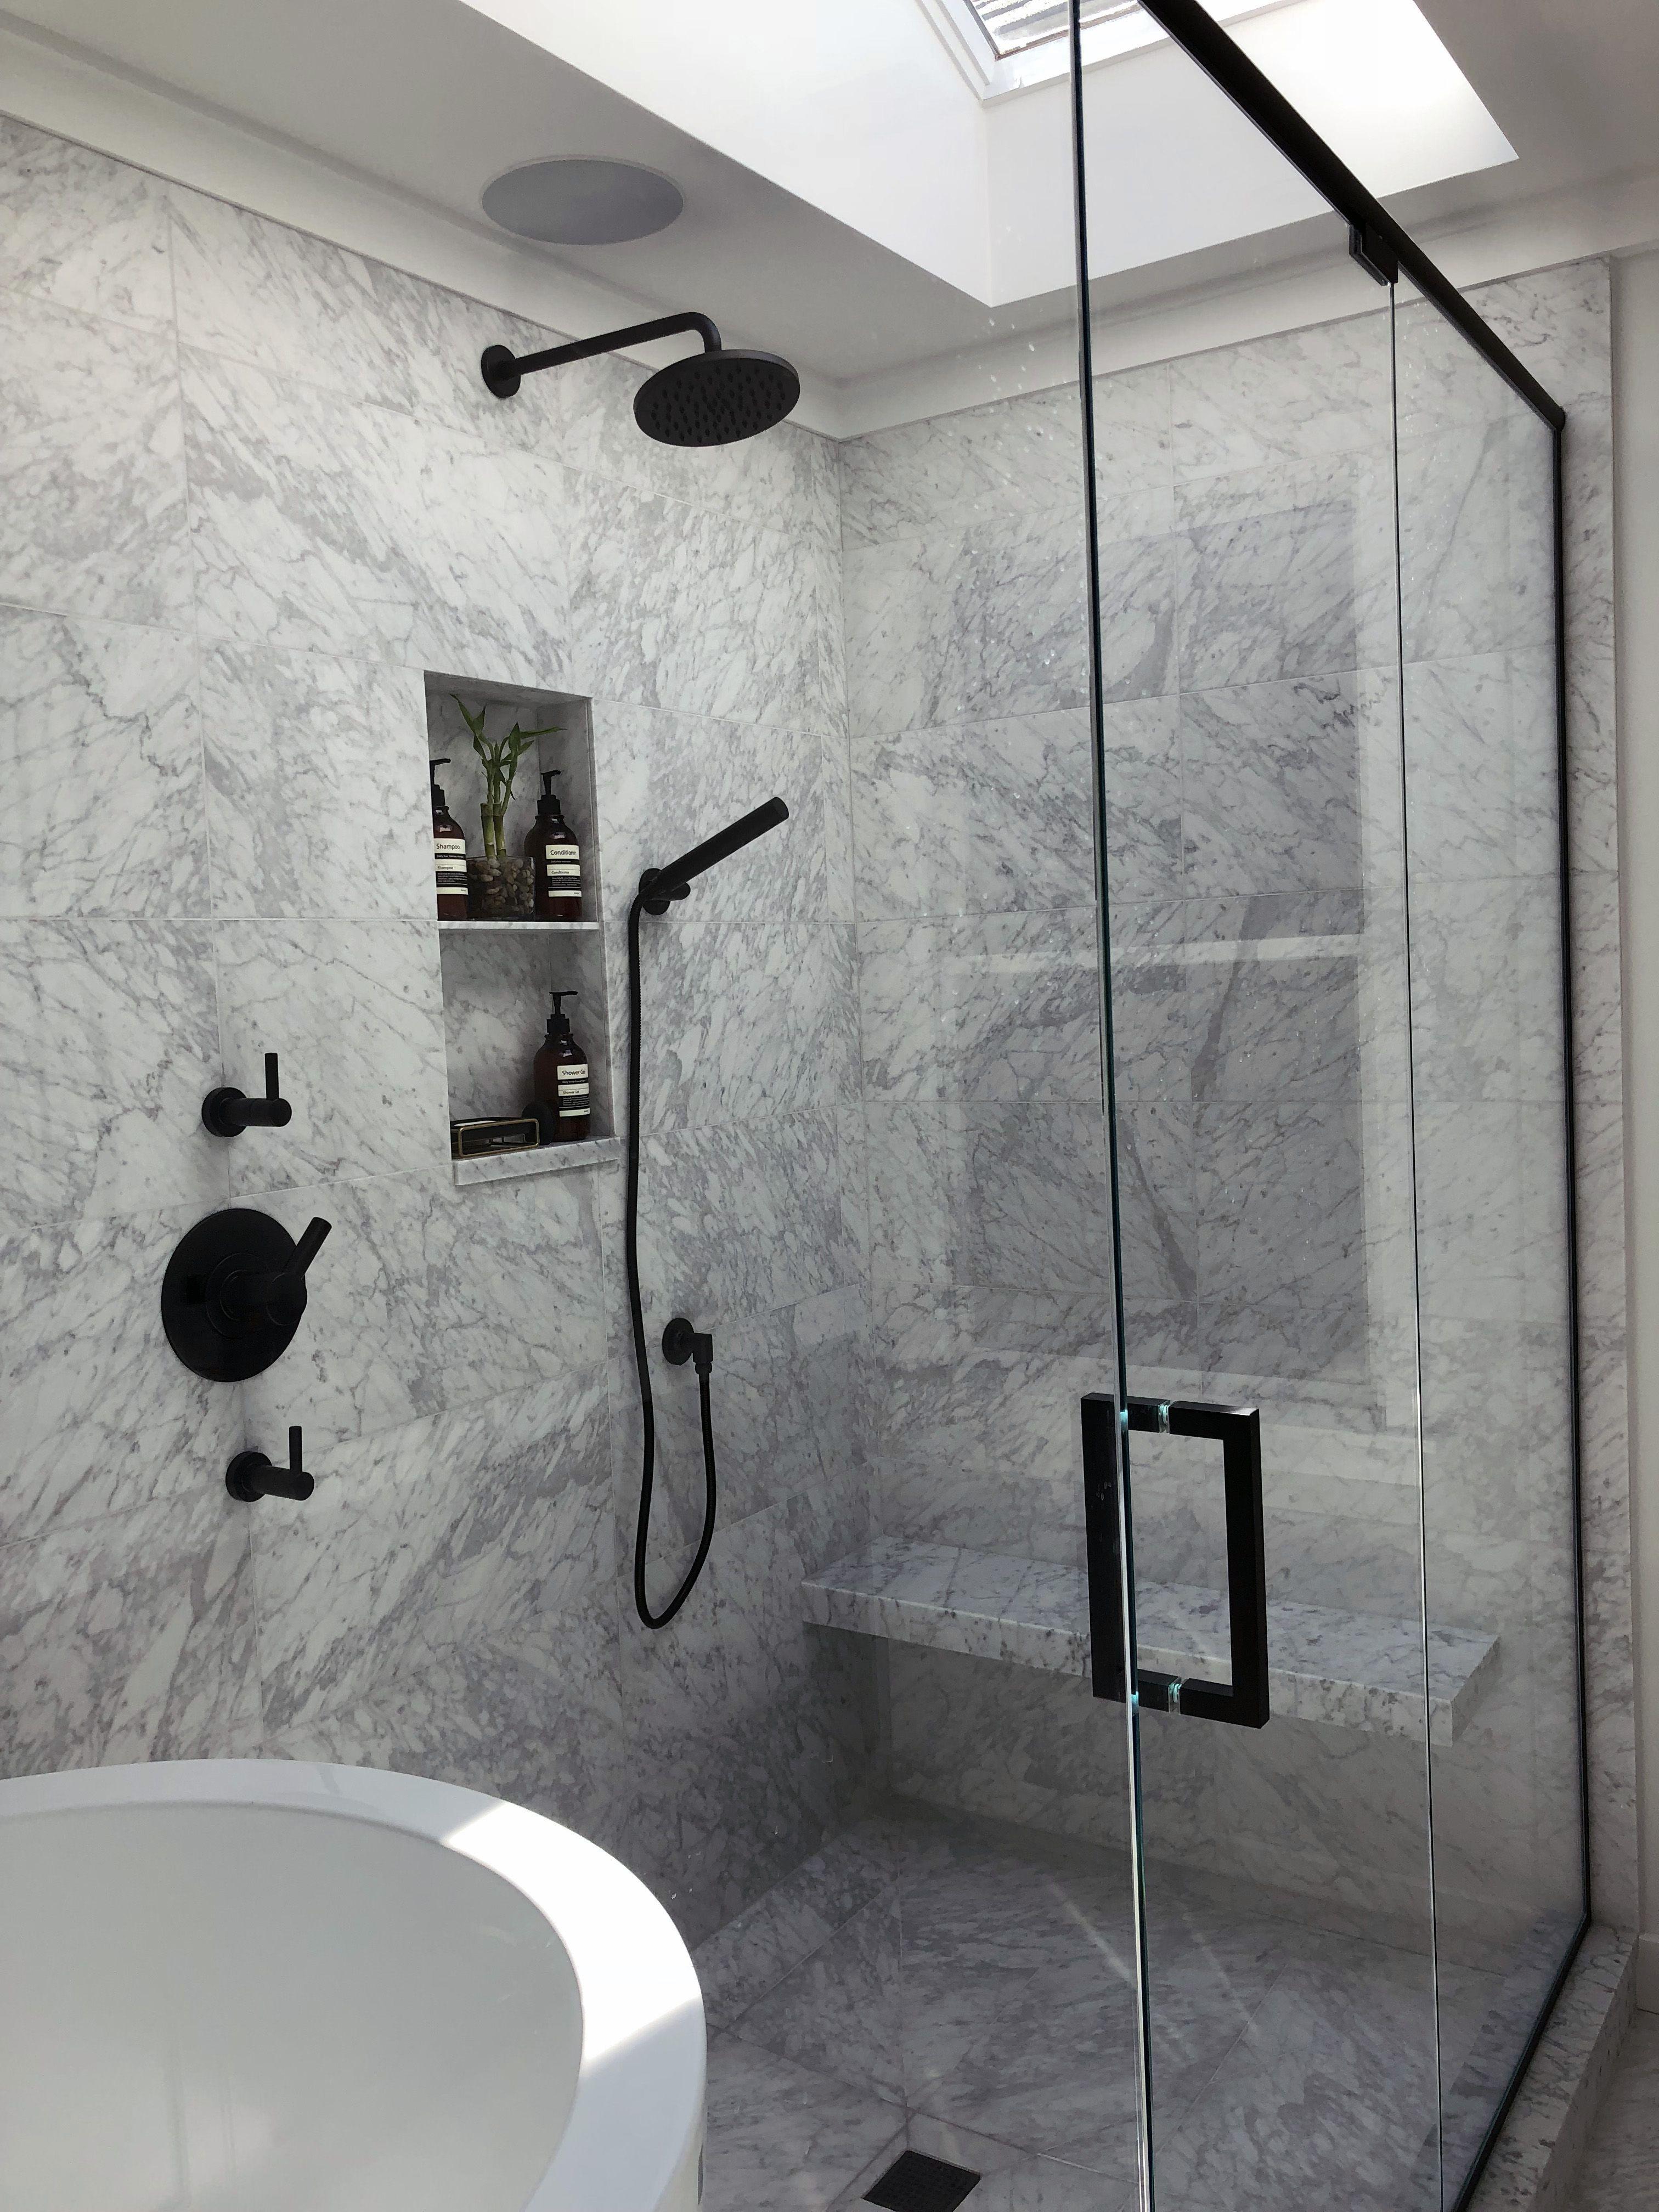 Wet Room With Japanese Soaking Tub Jasonwu Brizo Marble Siglo Wetroom Bathroom Bathroom Japanese Bathroom Design Japanese Bathroom Wet Room Bathroom Wet room shower design